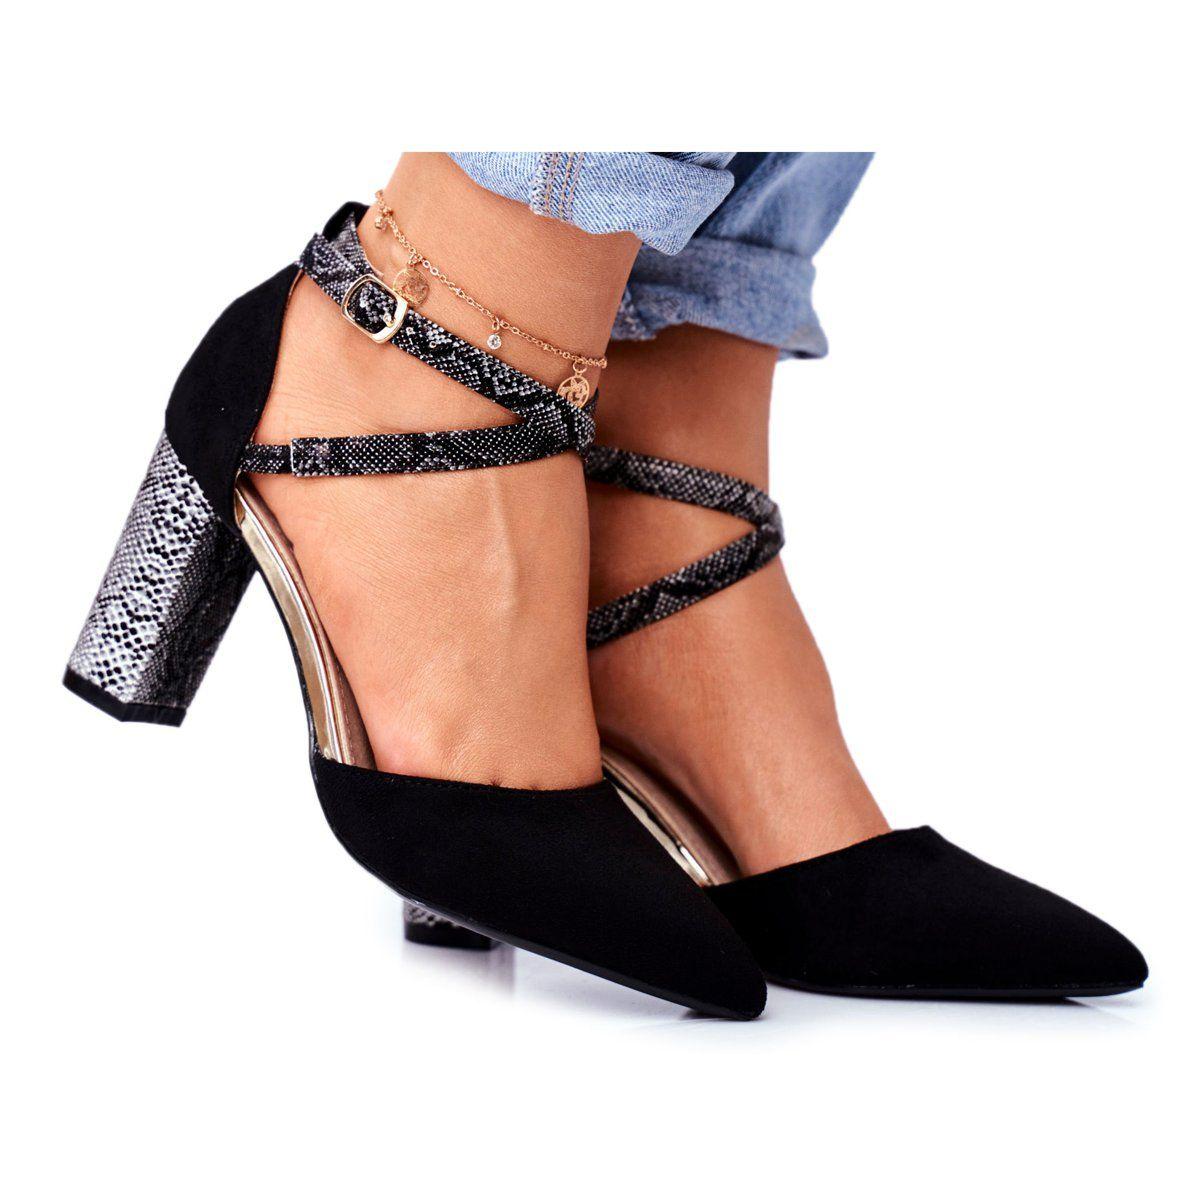 S Barski Czolenka Damskie Na Slupku Wezowe Czarne Together Wielokolorowe Heels Shoes Kitten Heels